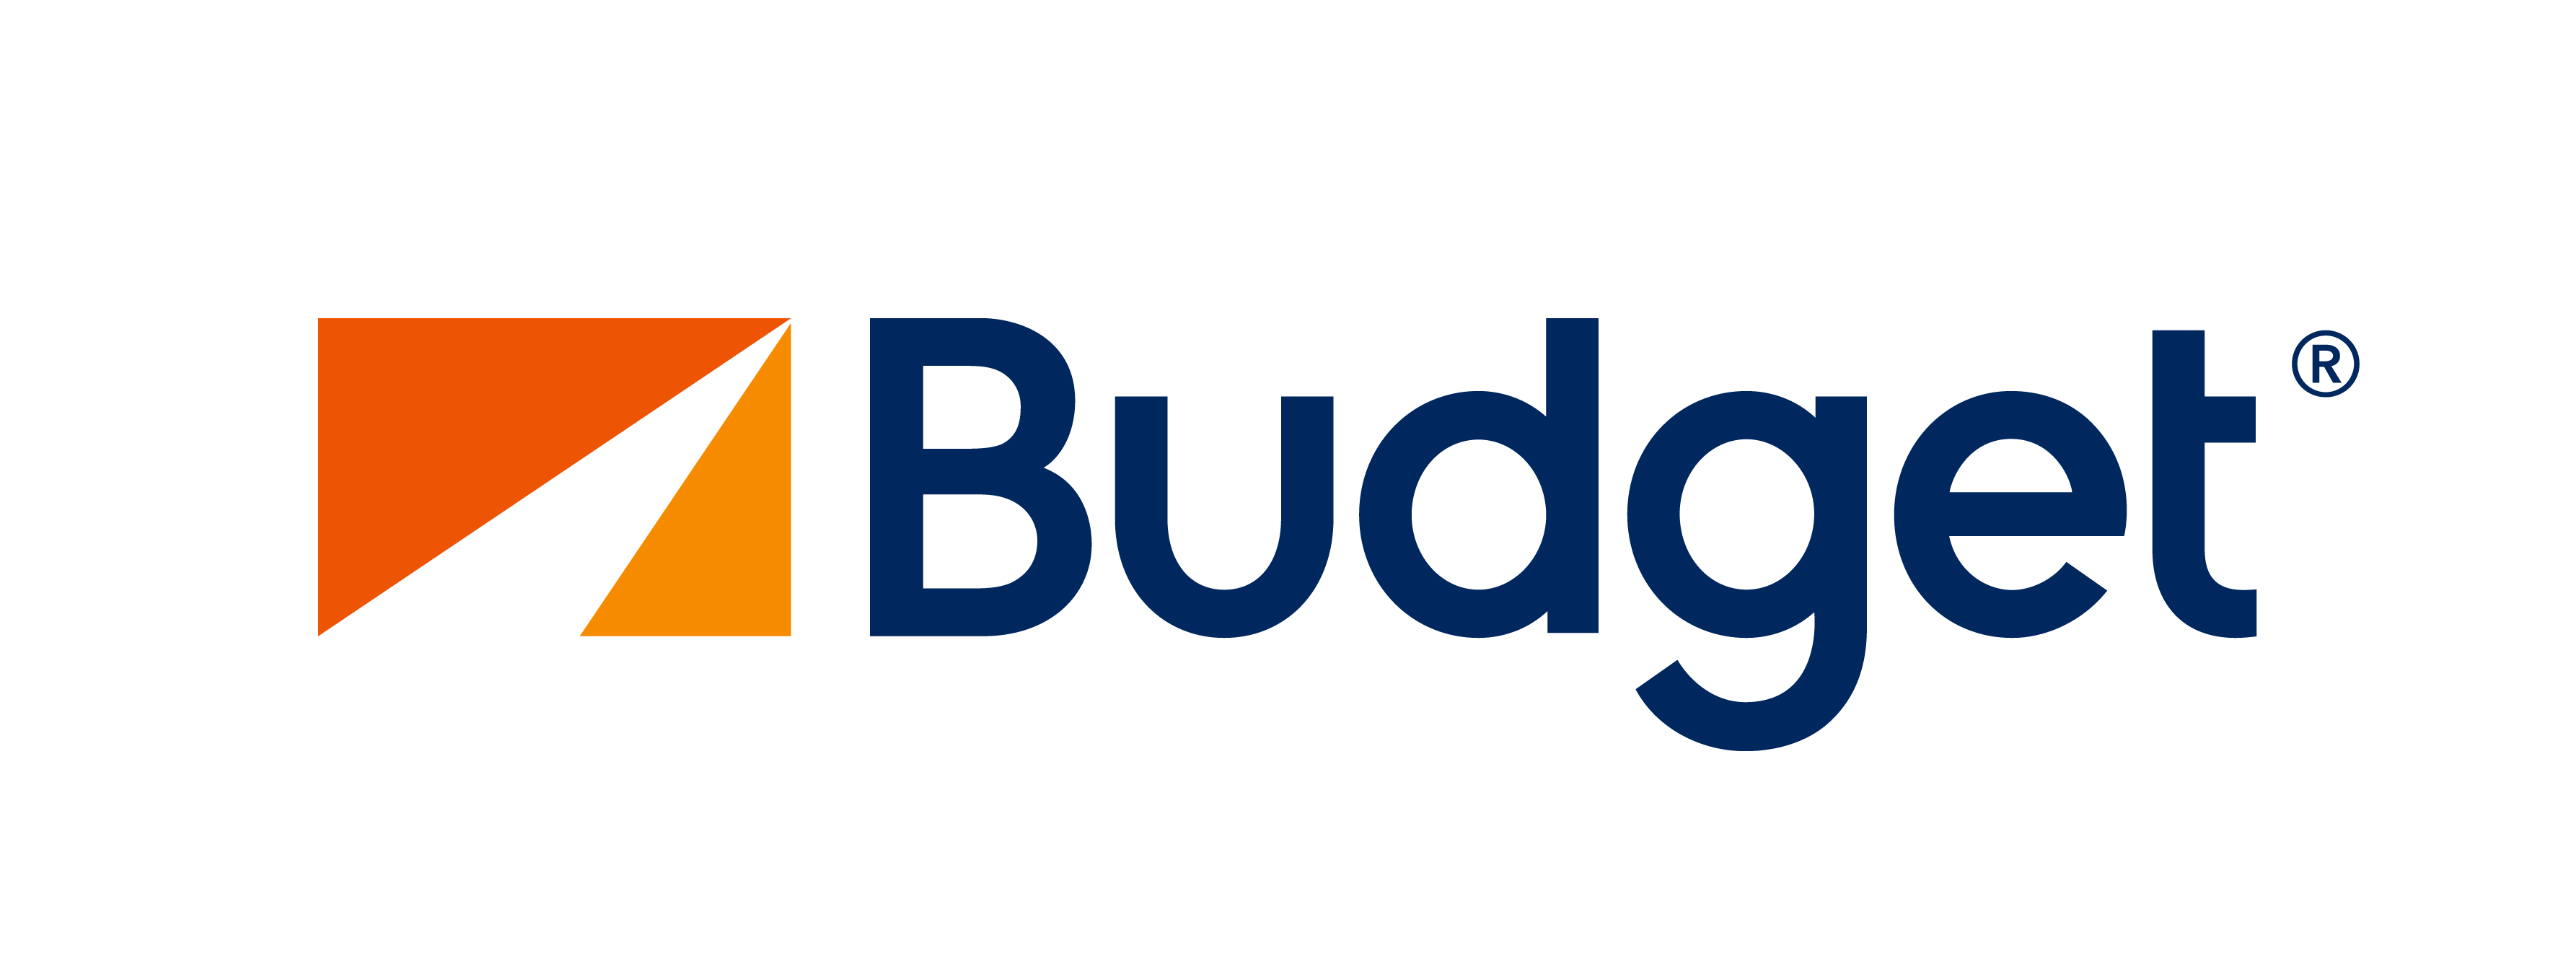 Budget Logo transparent PNG.